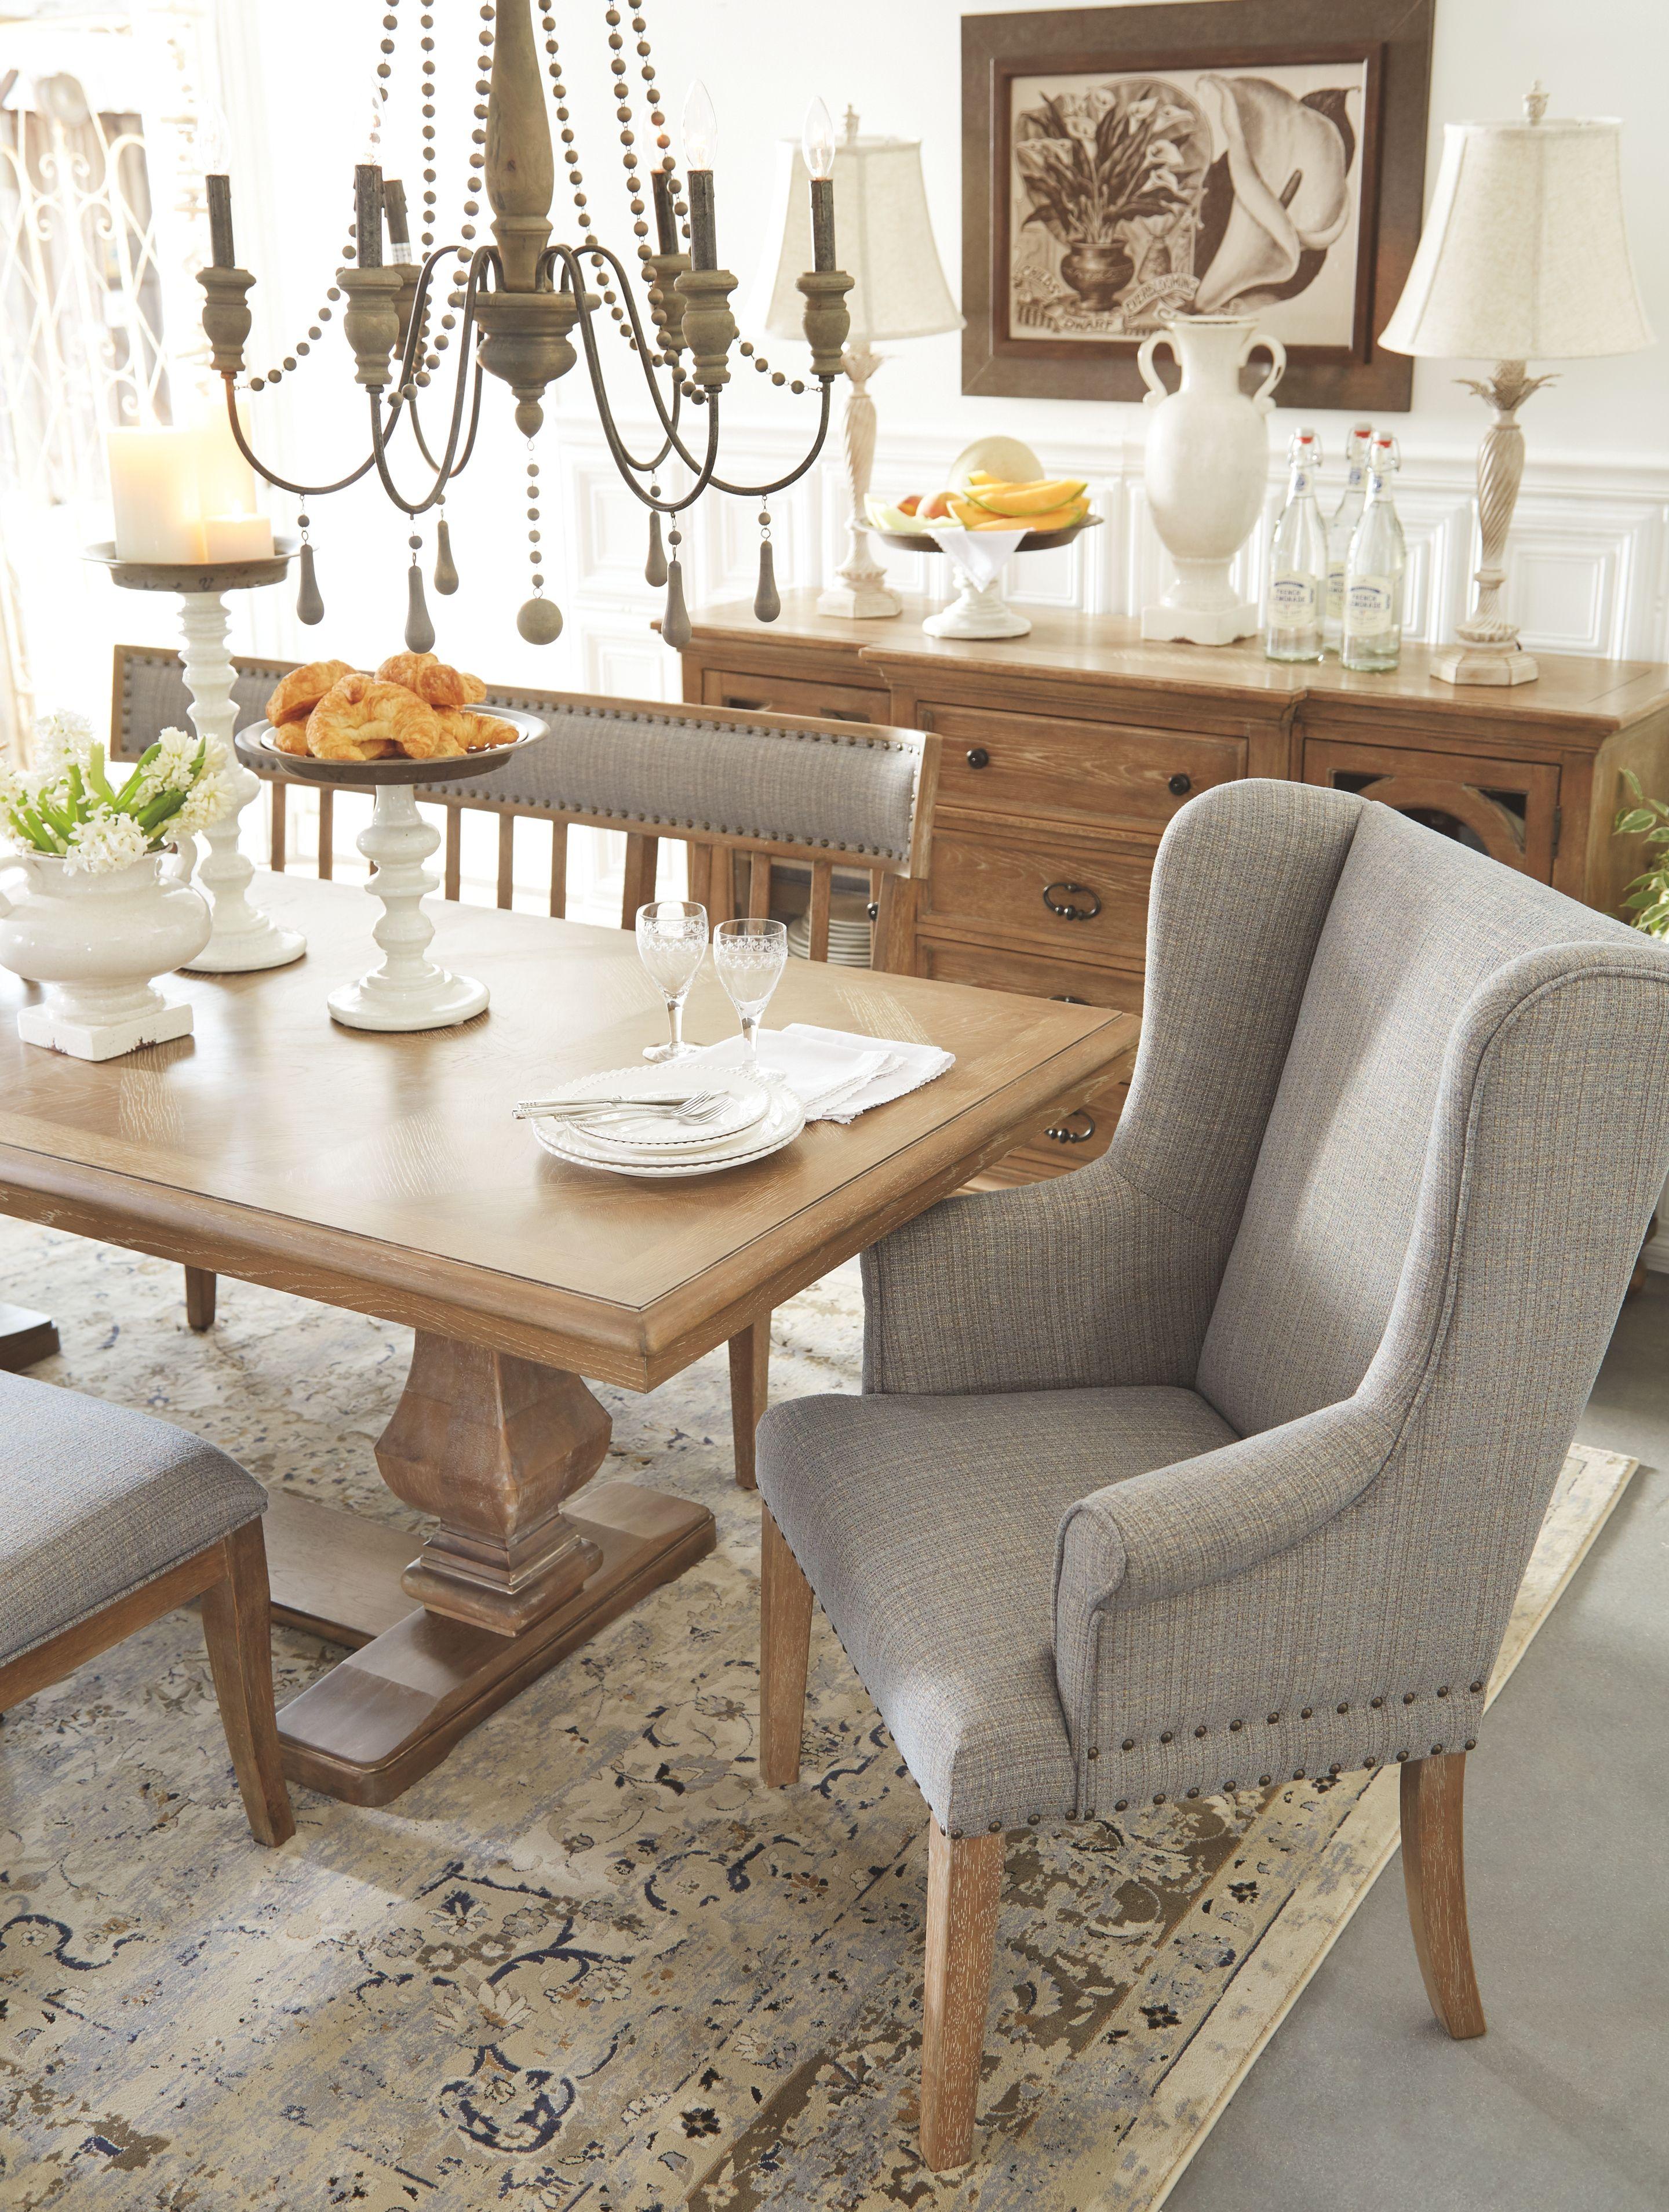 Ollesburg Dining Room Chair (Set of 2), Light Blue | Shabby ...